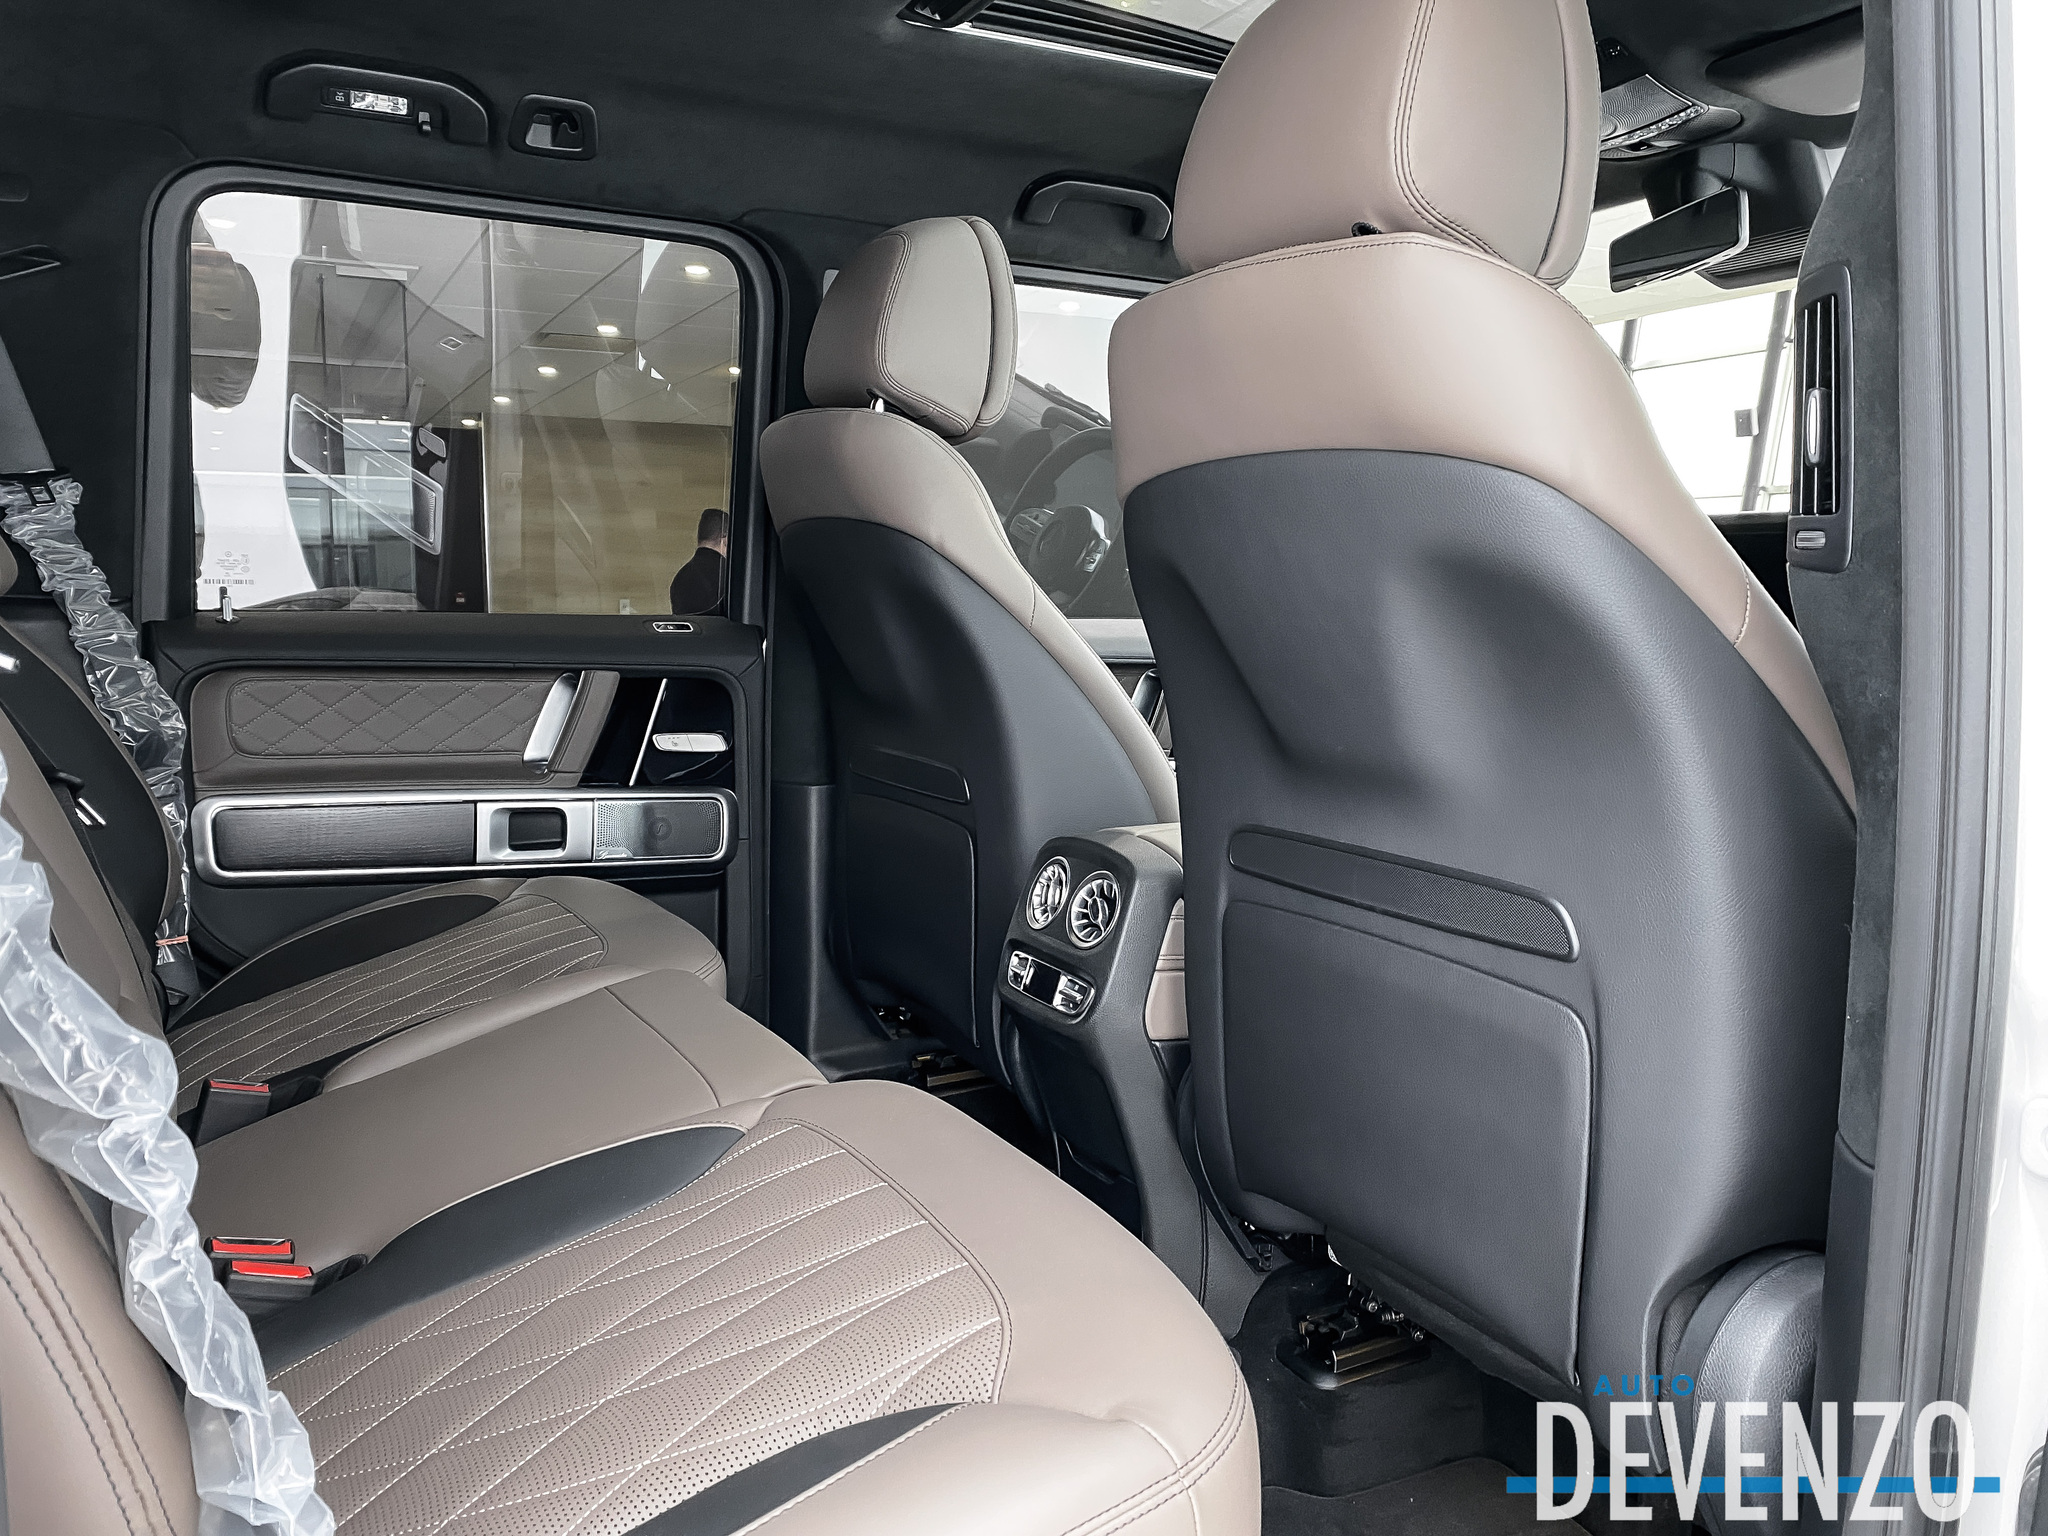 2020 Mercedes-Benz G-Class AMG G63 4MATIC complet